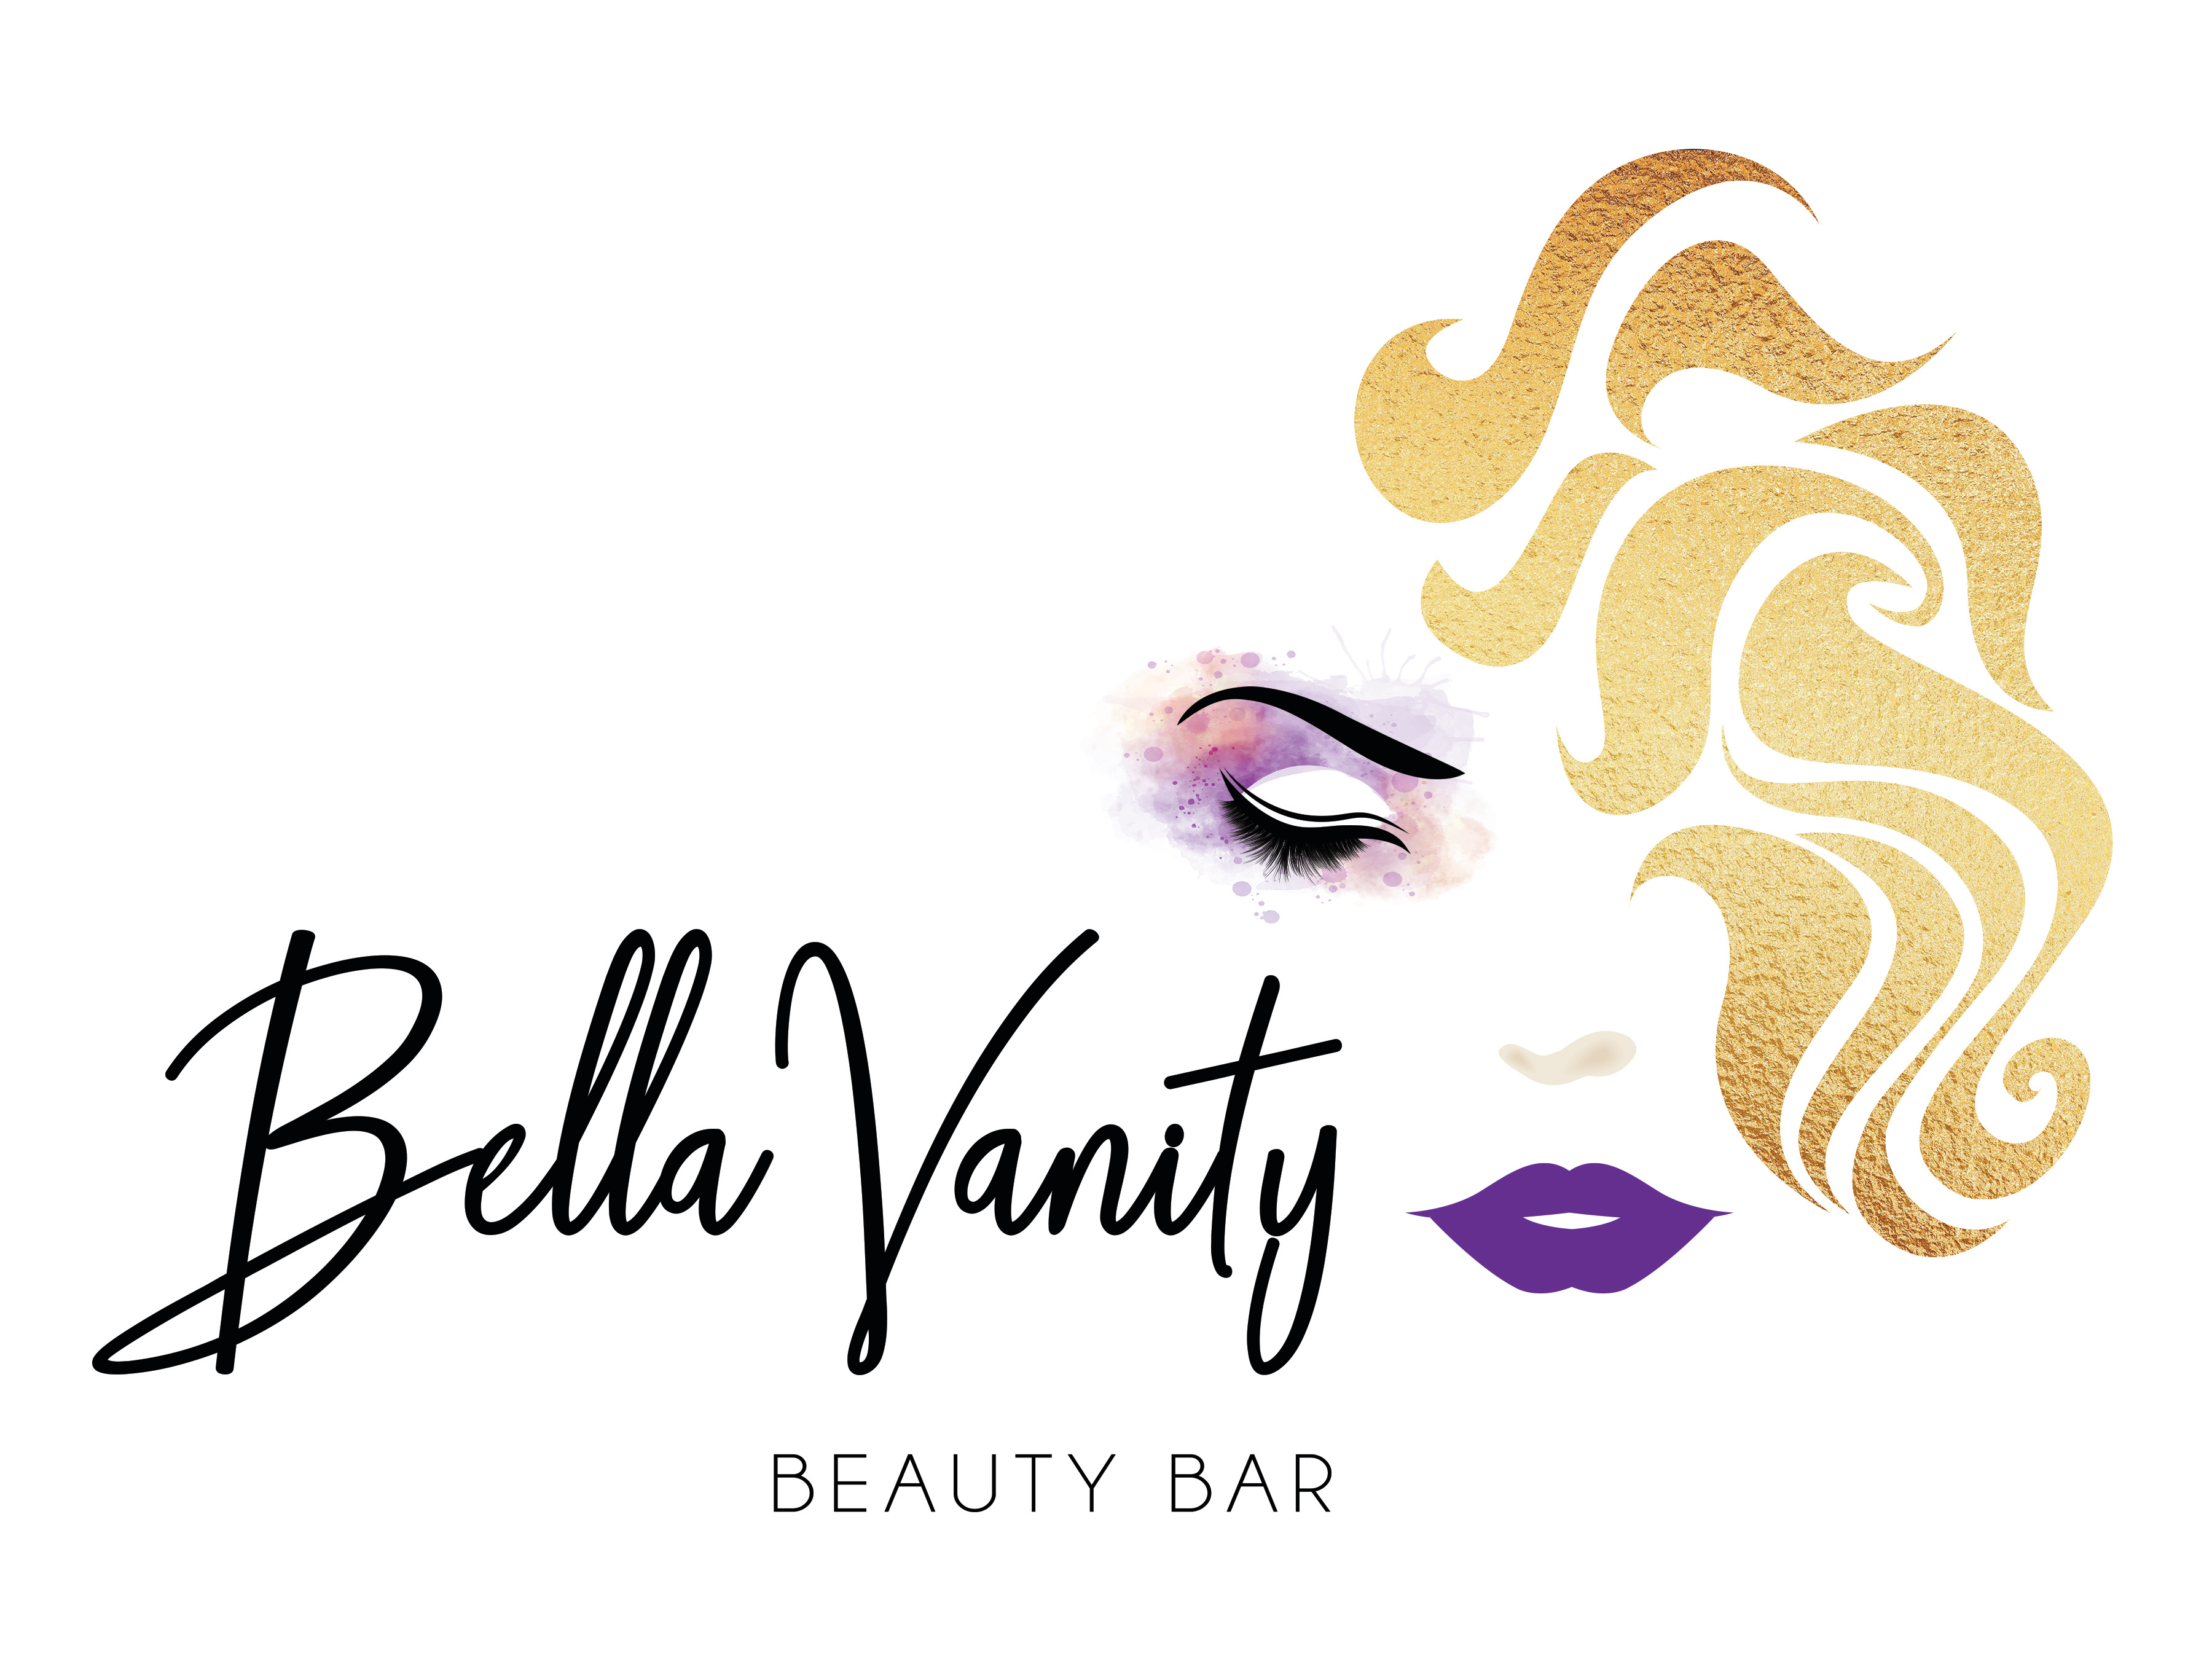 Bella Vanity Beauty Bar